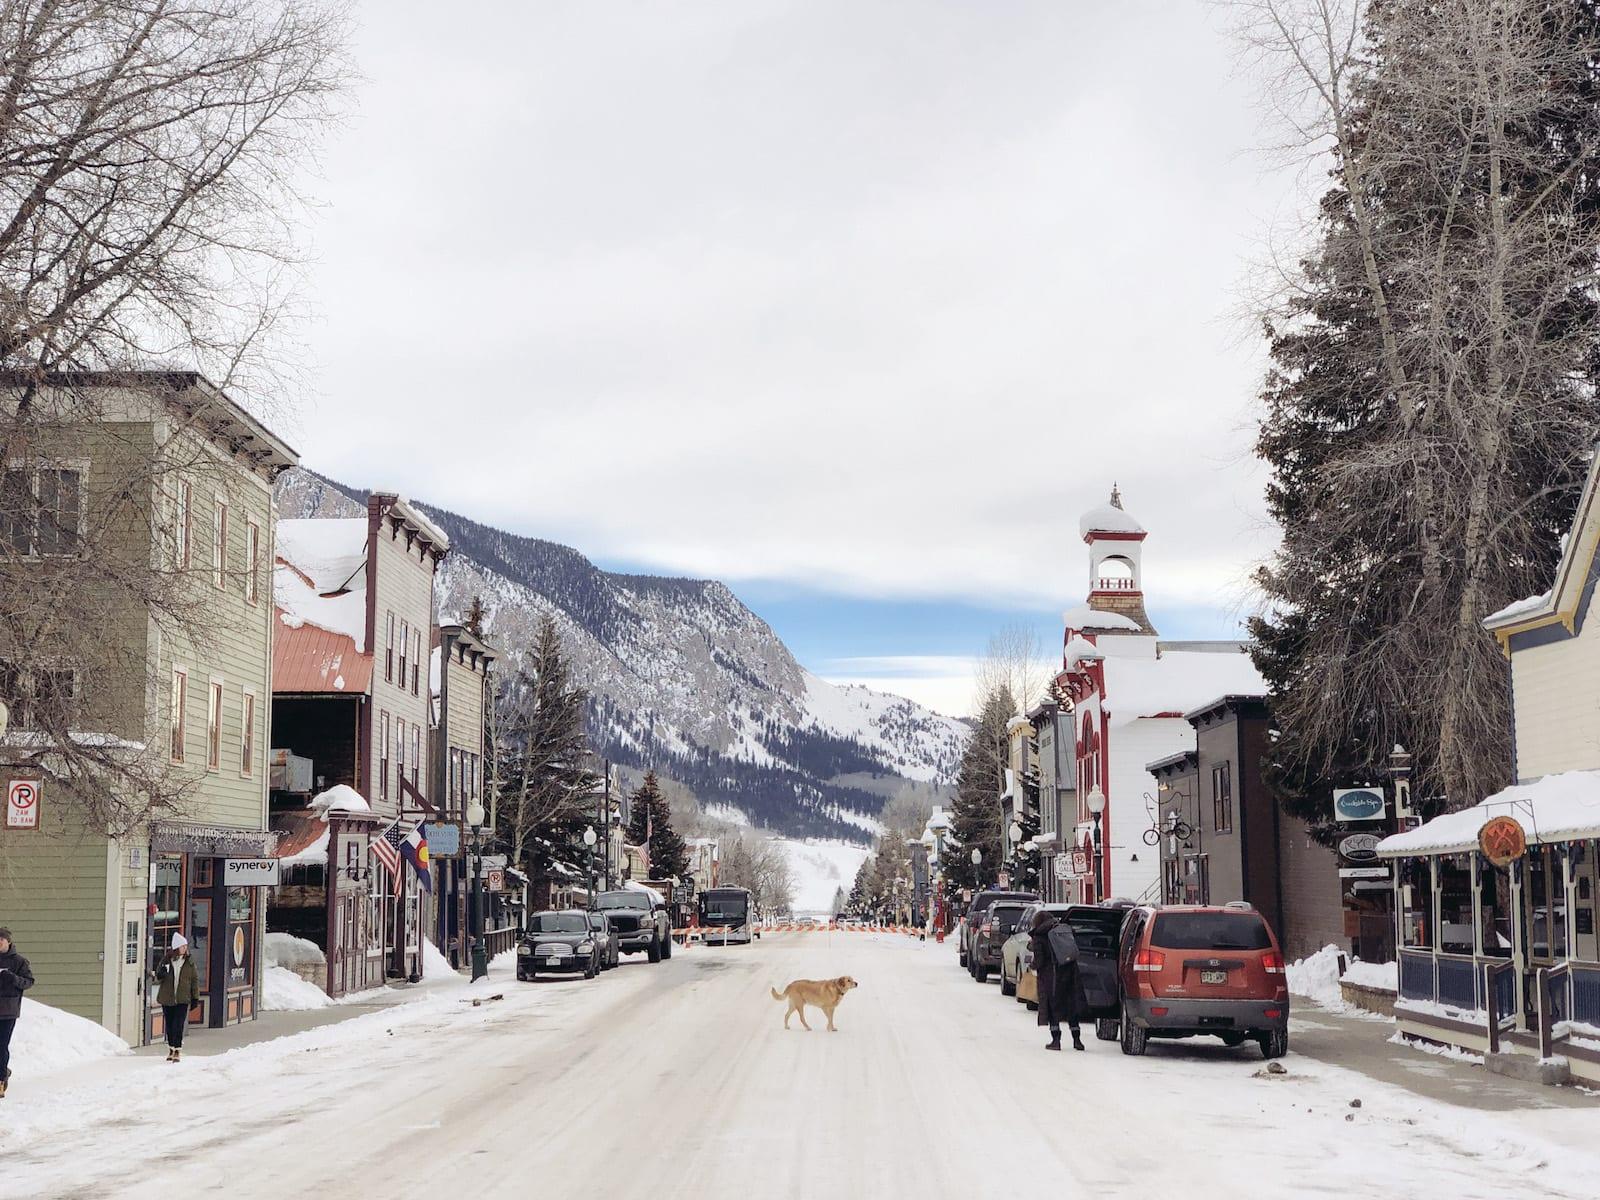 Elk Avenue in Crested Butte, Colorado